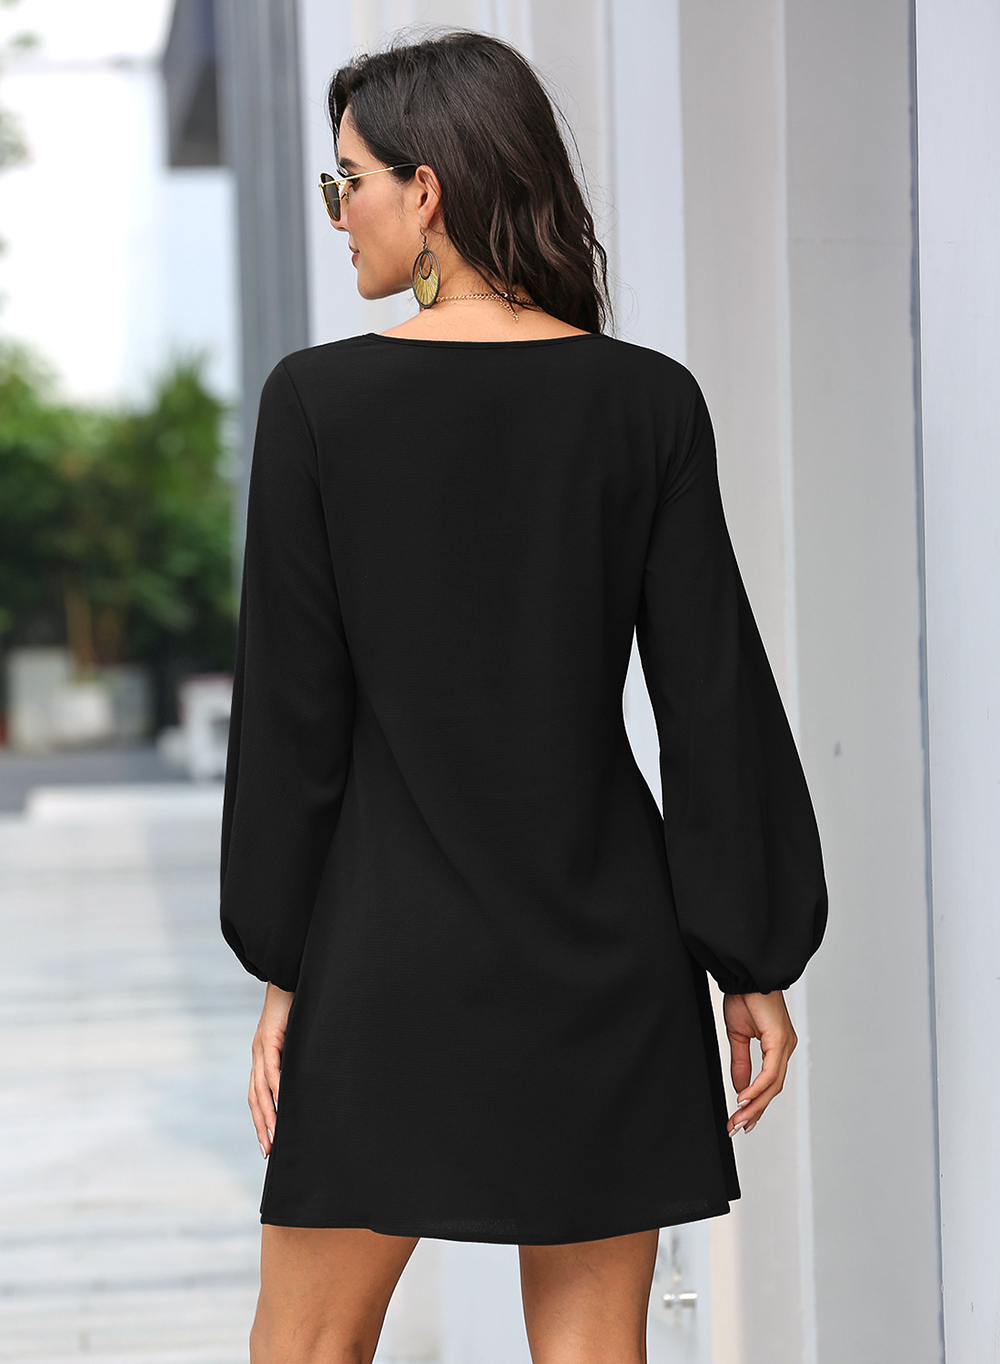 Black Lantern Sleeve Round Neck Casual Dress 22